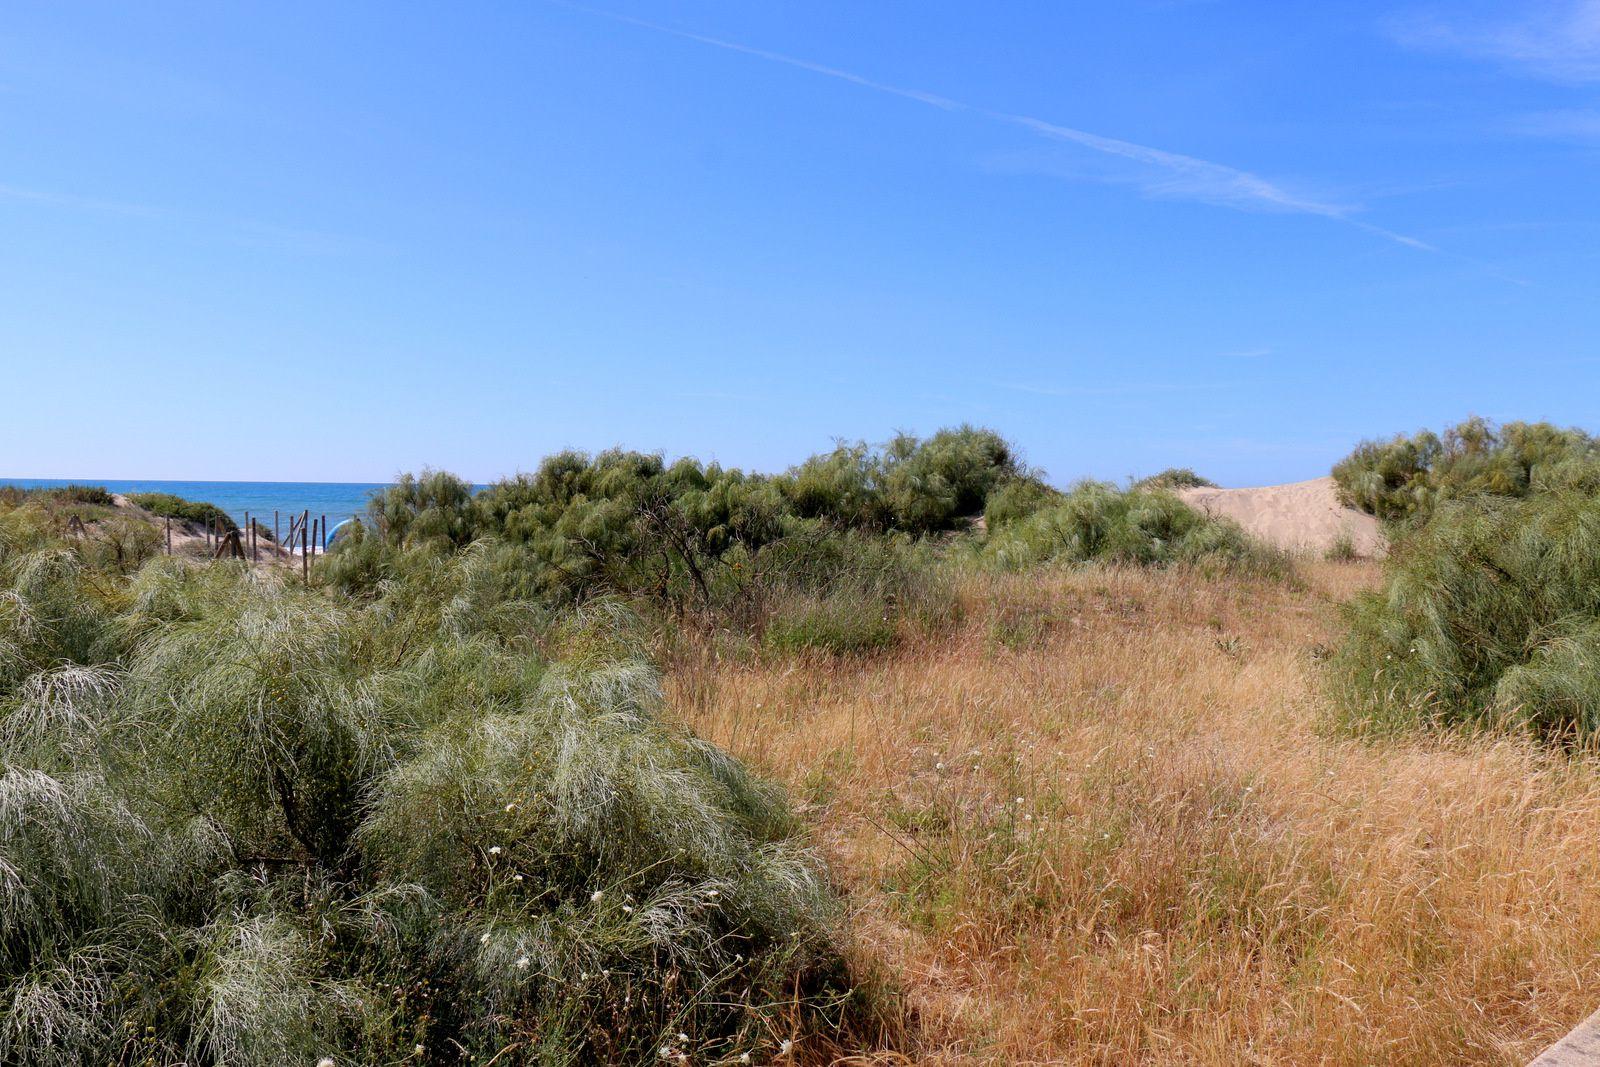 Sur la promenade du bord de mer, Islantilla (Andalousie)